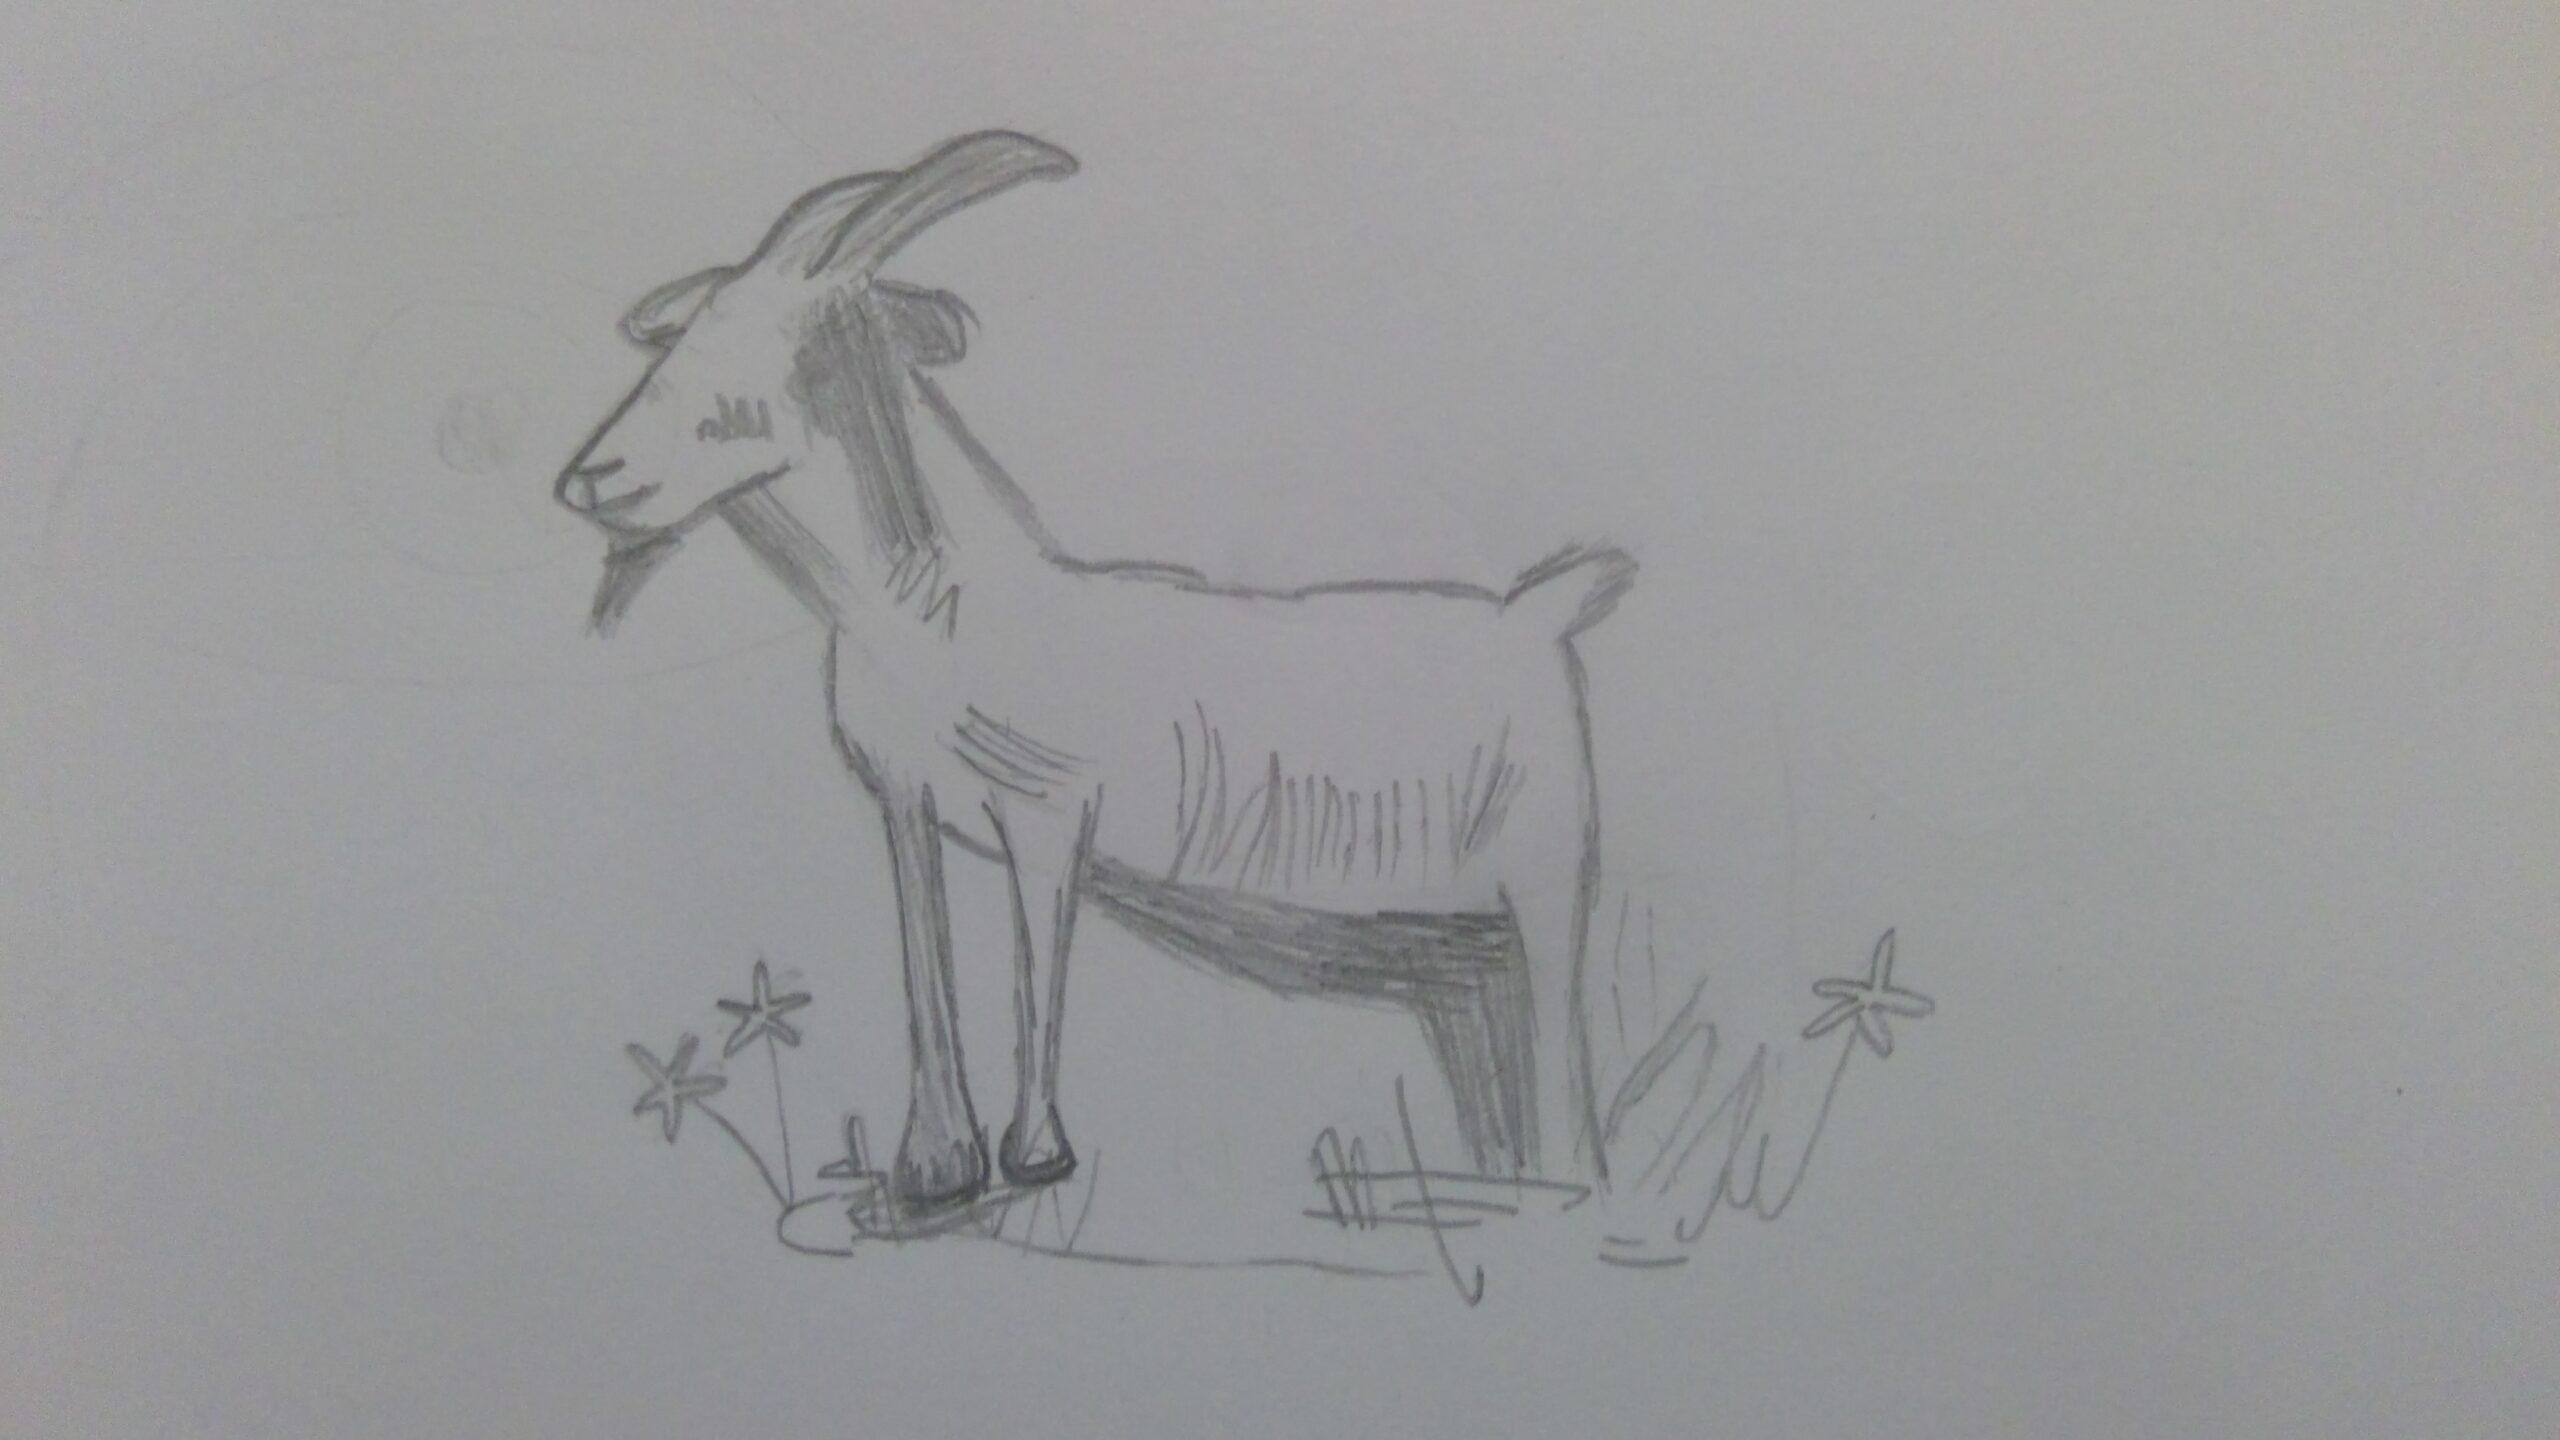 Shraddha Kori, Age 10